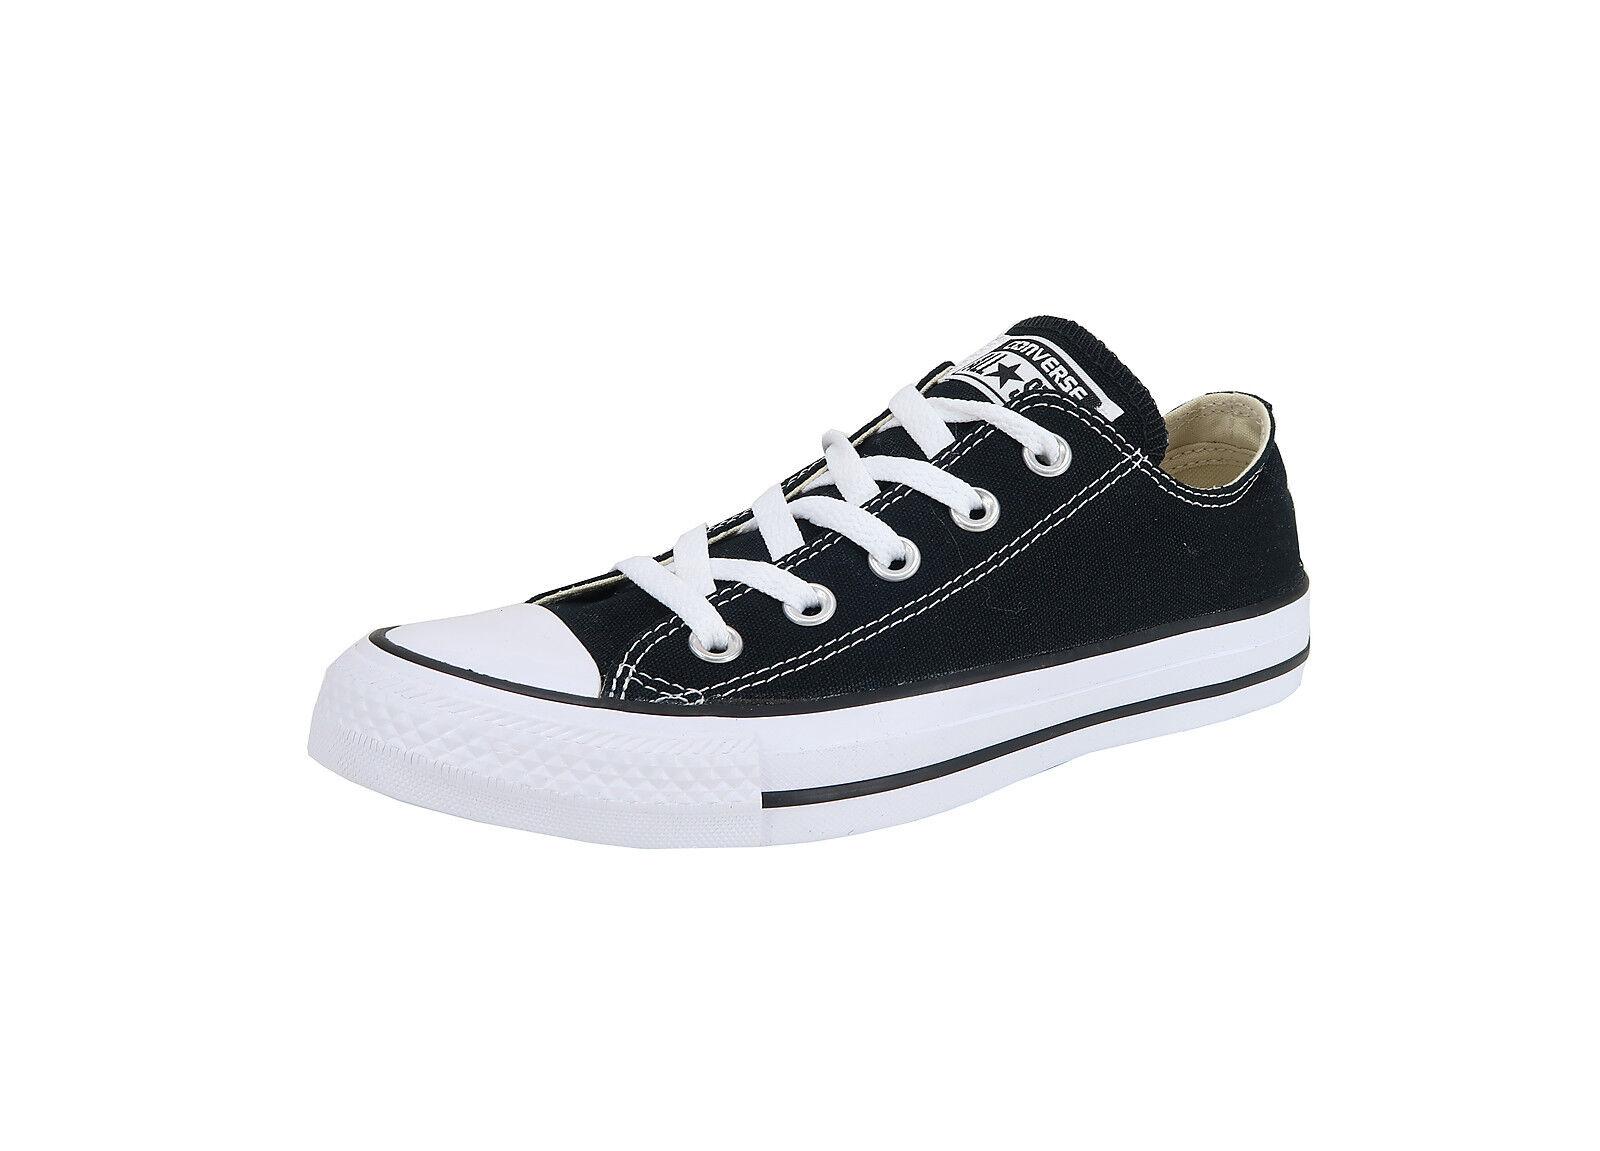 Converse Femme Chaussures Classic Chuck Taylor Low Top Noir Blanc Fashion CTAL